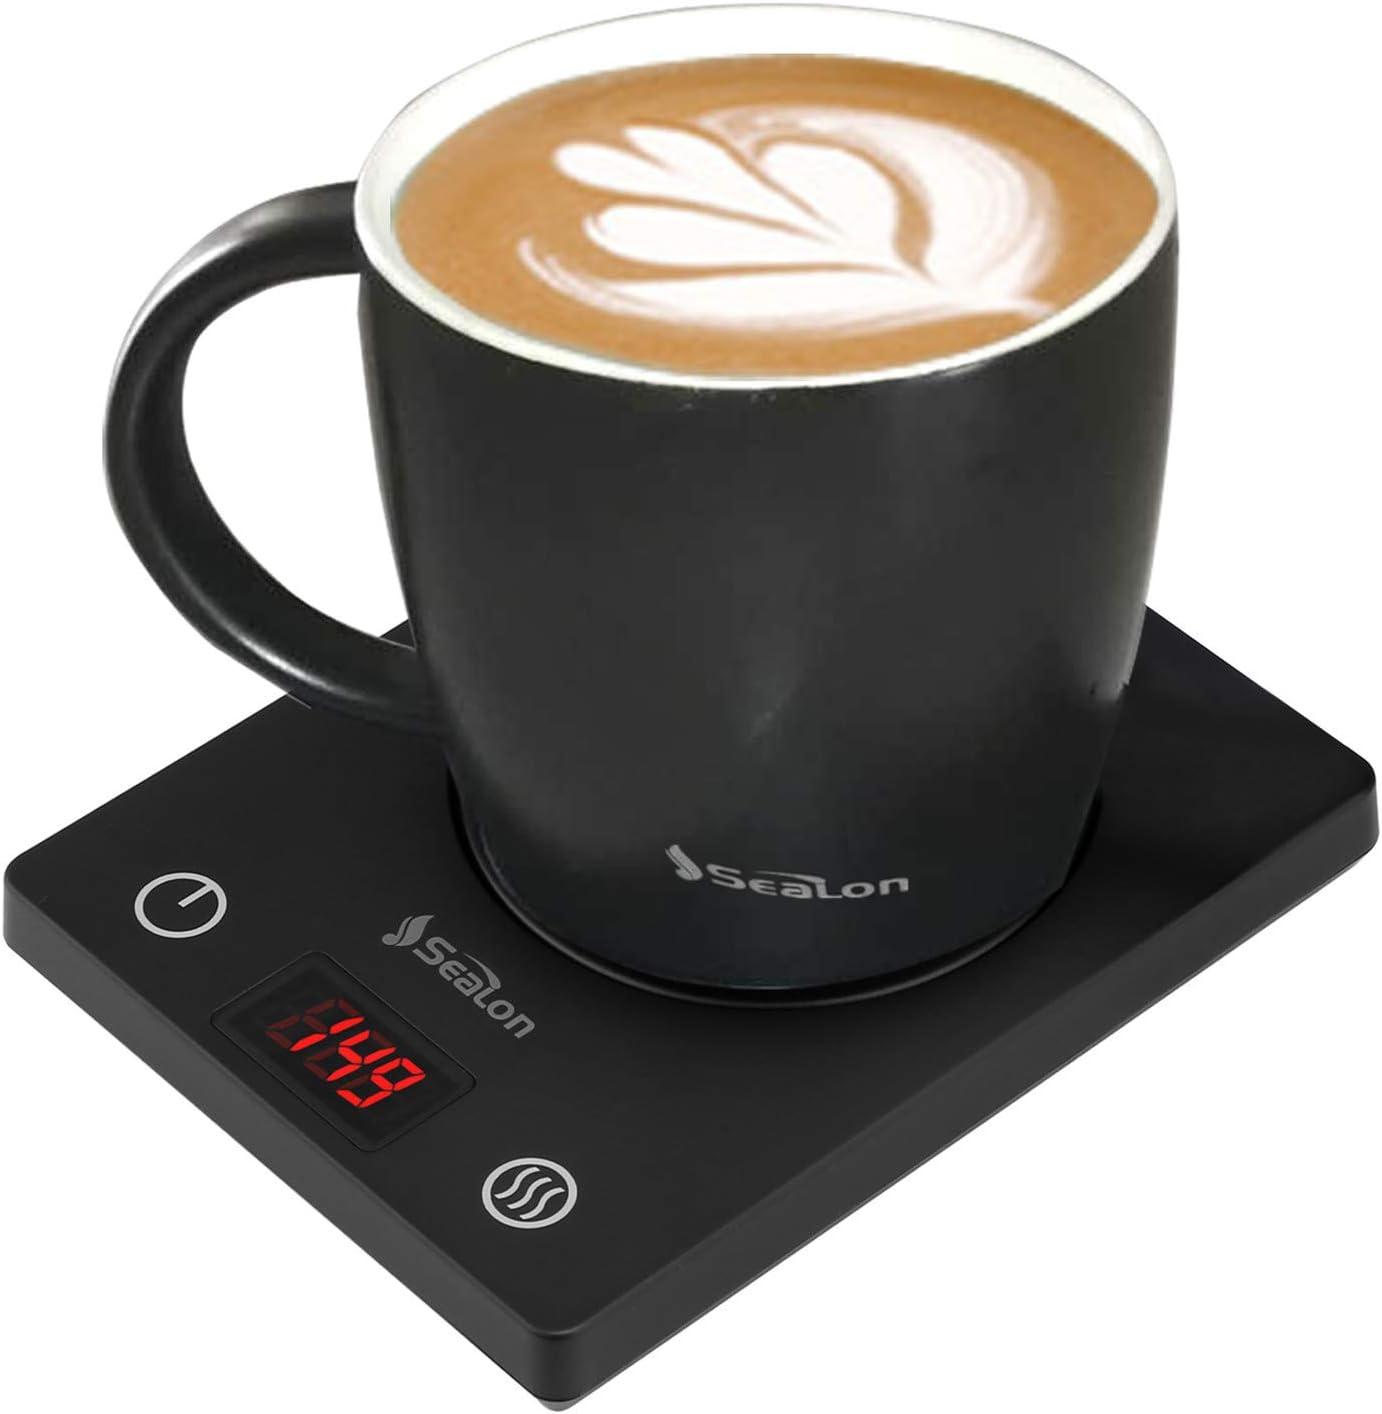 Smart Coffee Mug Warmer Set Auto On/Off Gravity-induction Mug Office Desk Use, Candle Wax Cup Warmer Heating Plate (Up To 149F/65C), 18.5oz